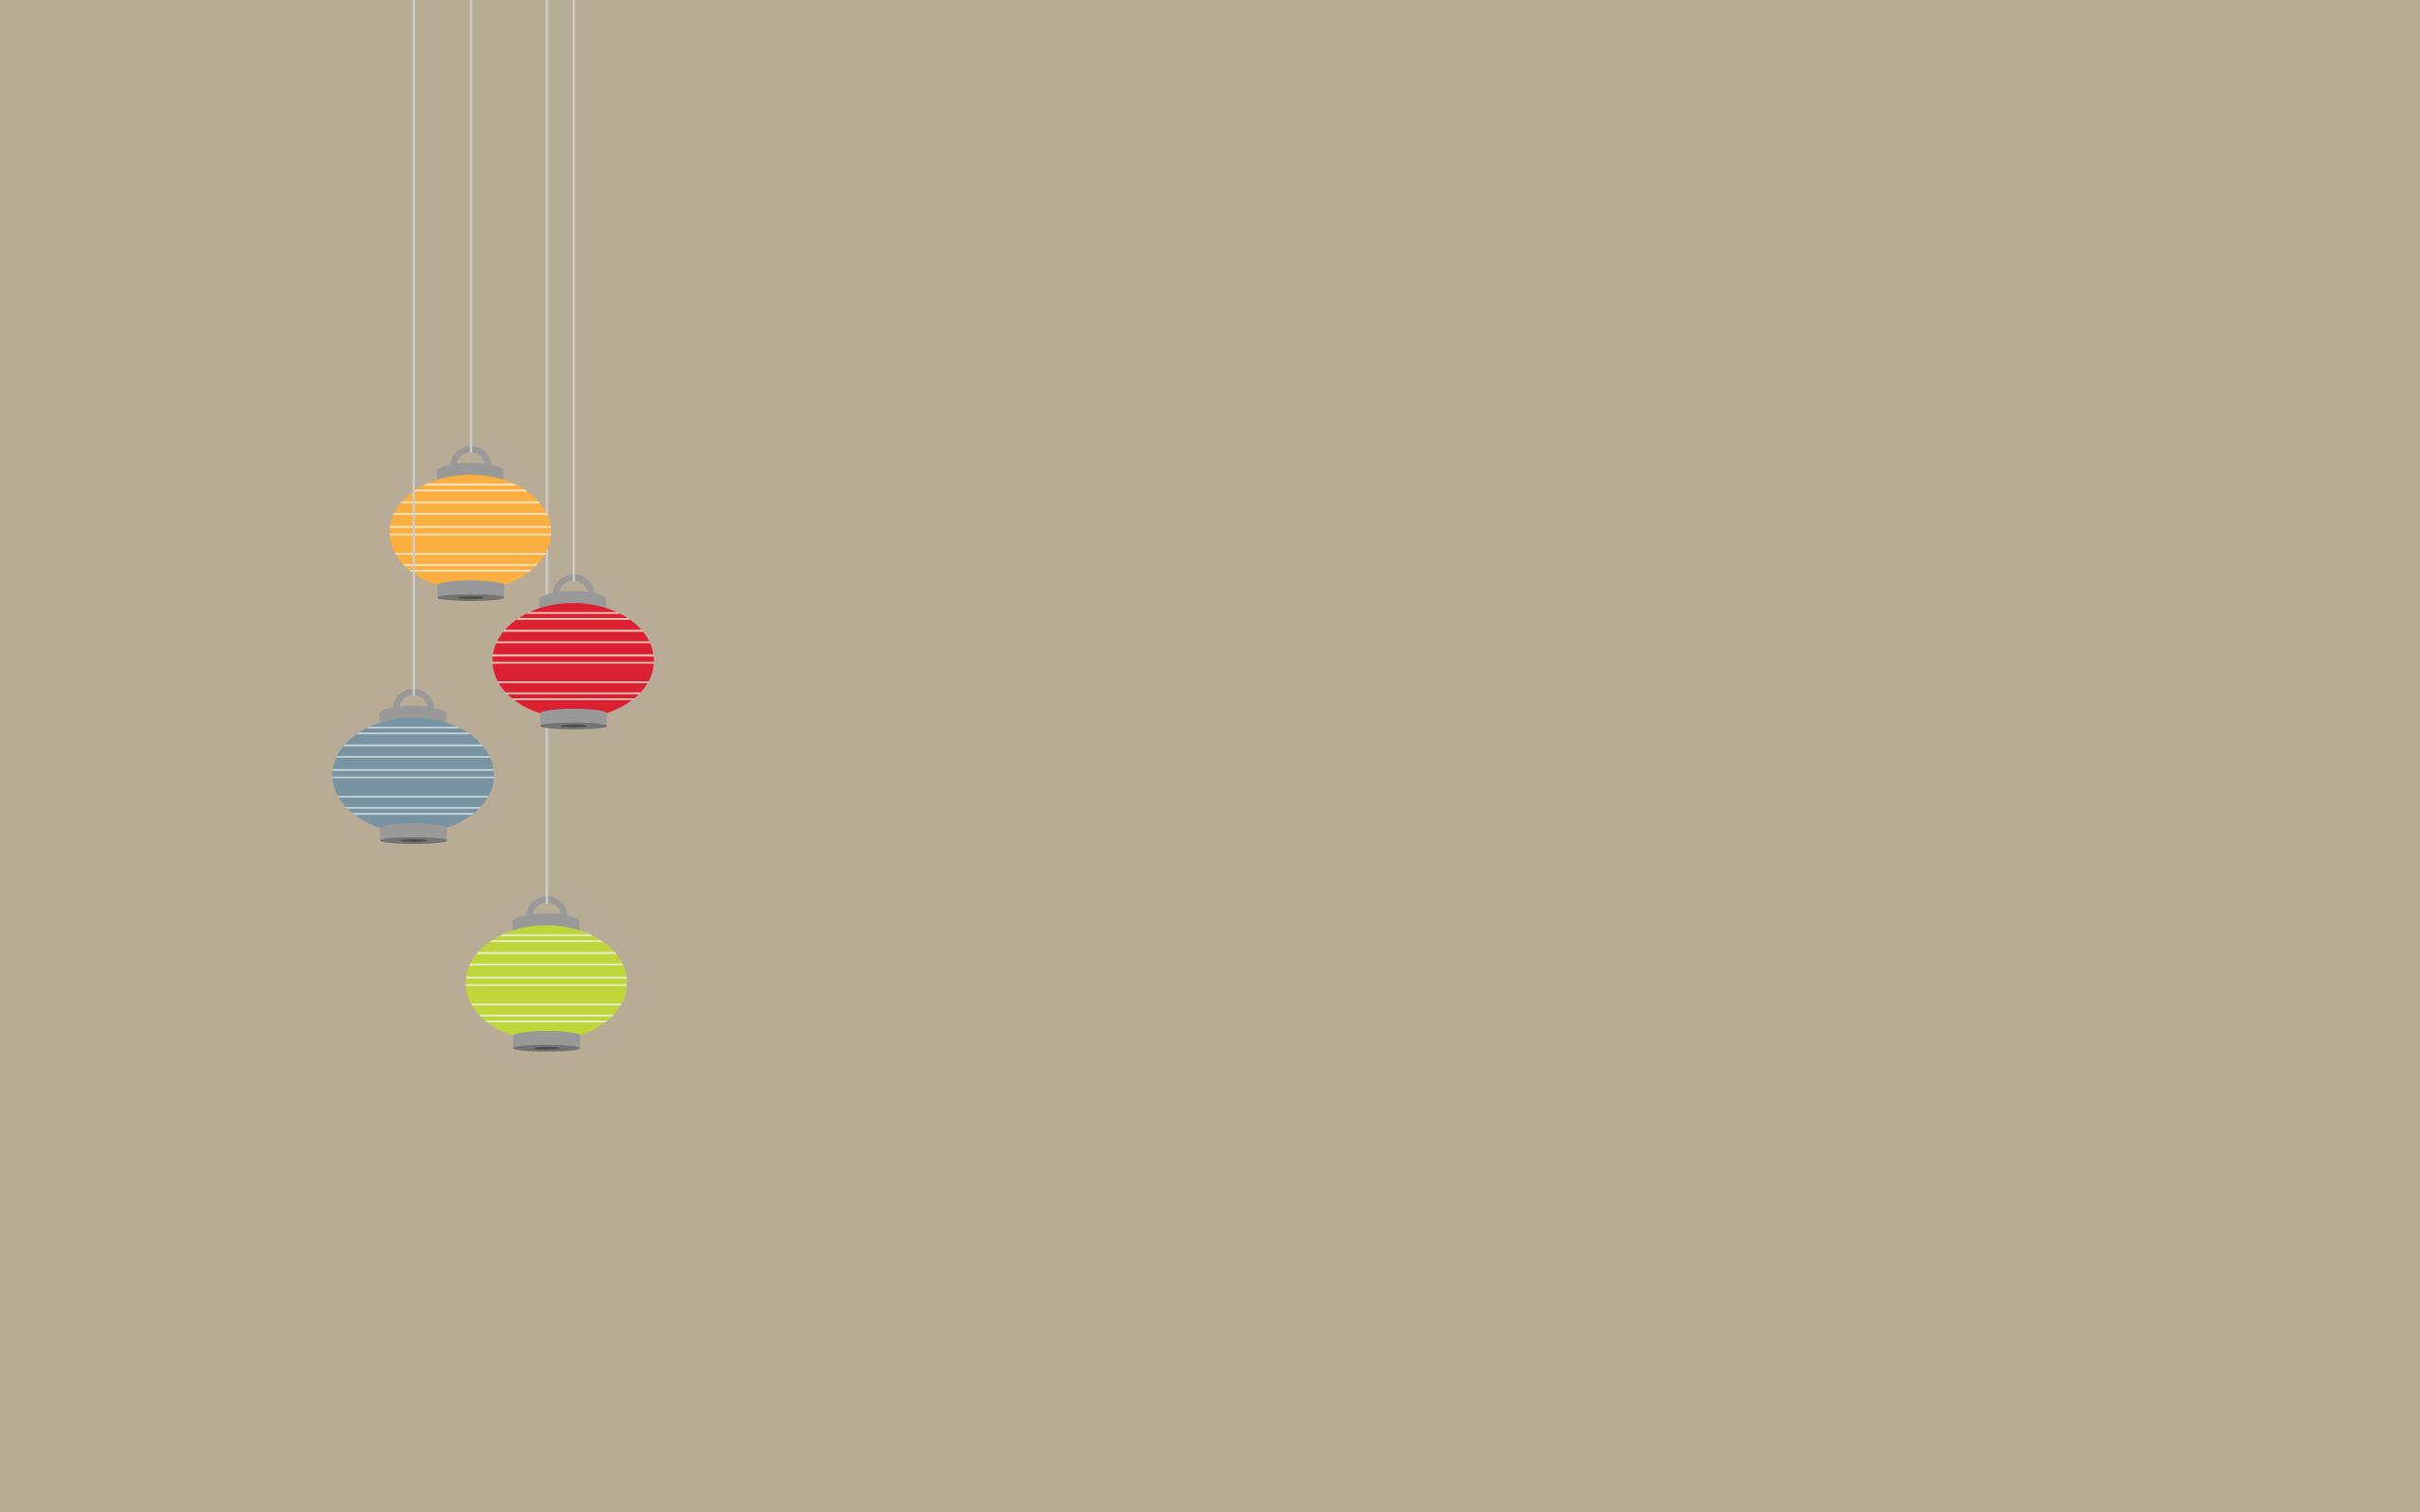 Free Download Minimalist Desktop Wallpaper 2560x1600 For